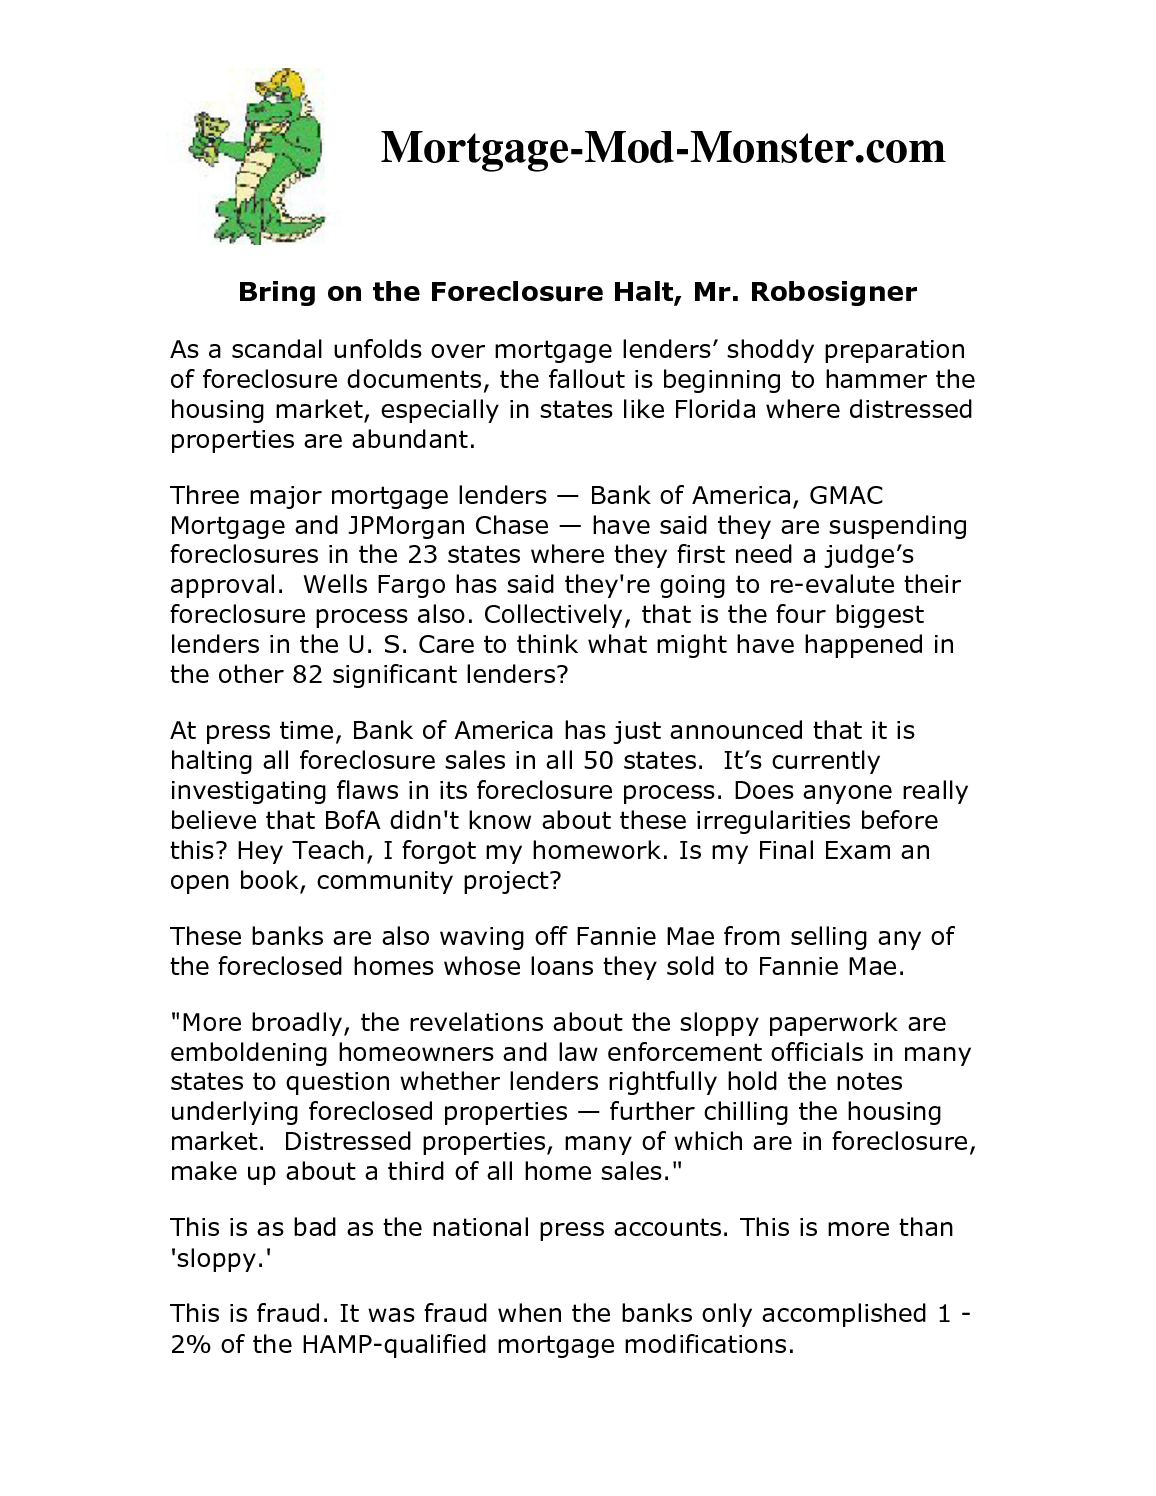 Calaméo - Bring on the Foreclosure Halt, Mr  Robo-signer